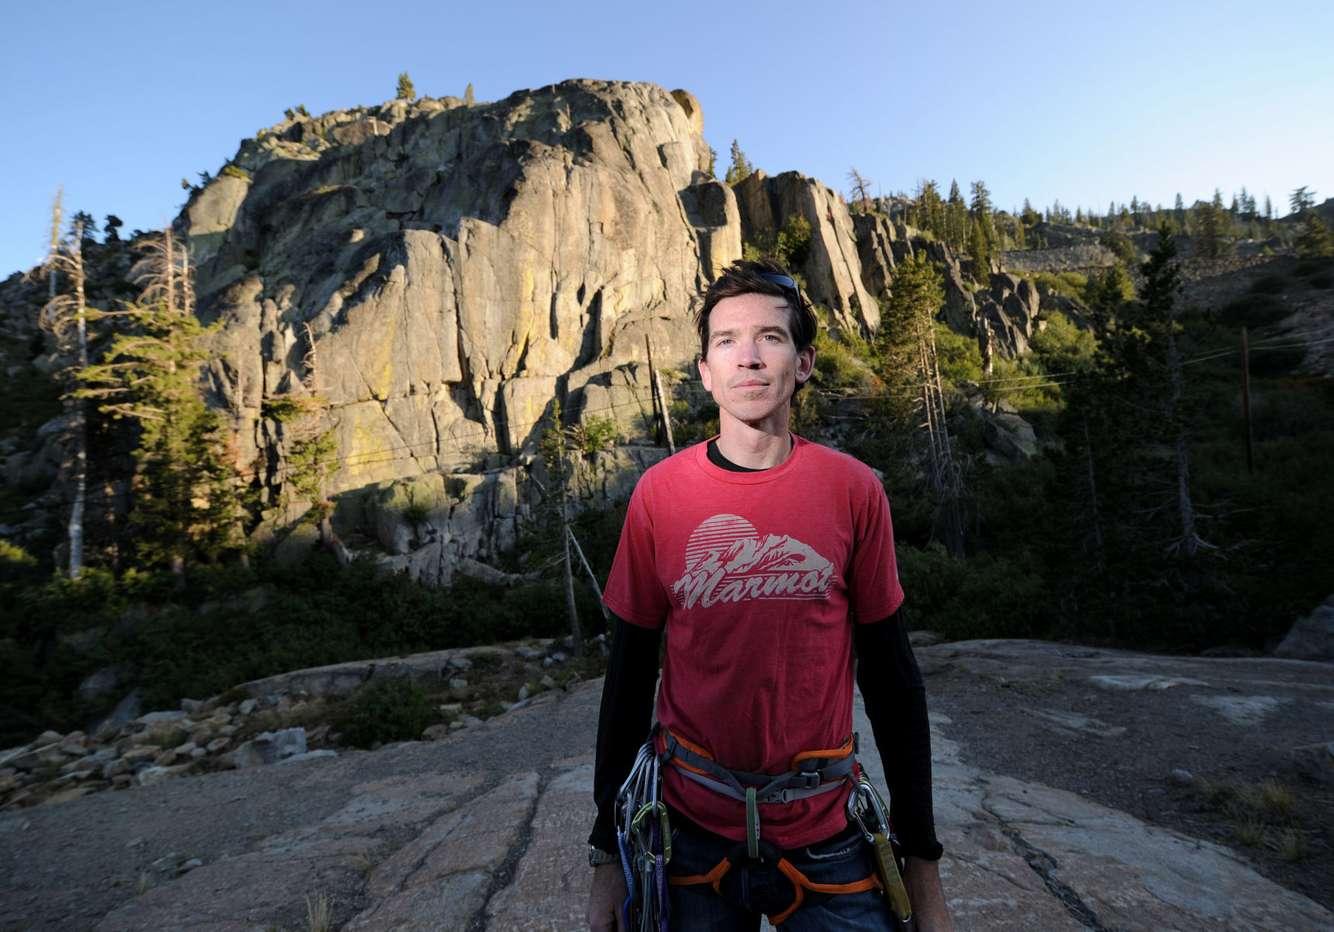 British mountaineer/guide Adrian Ballinger